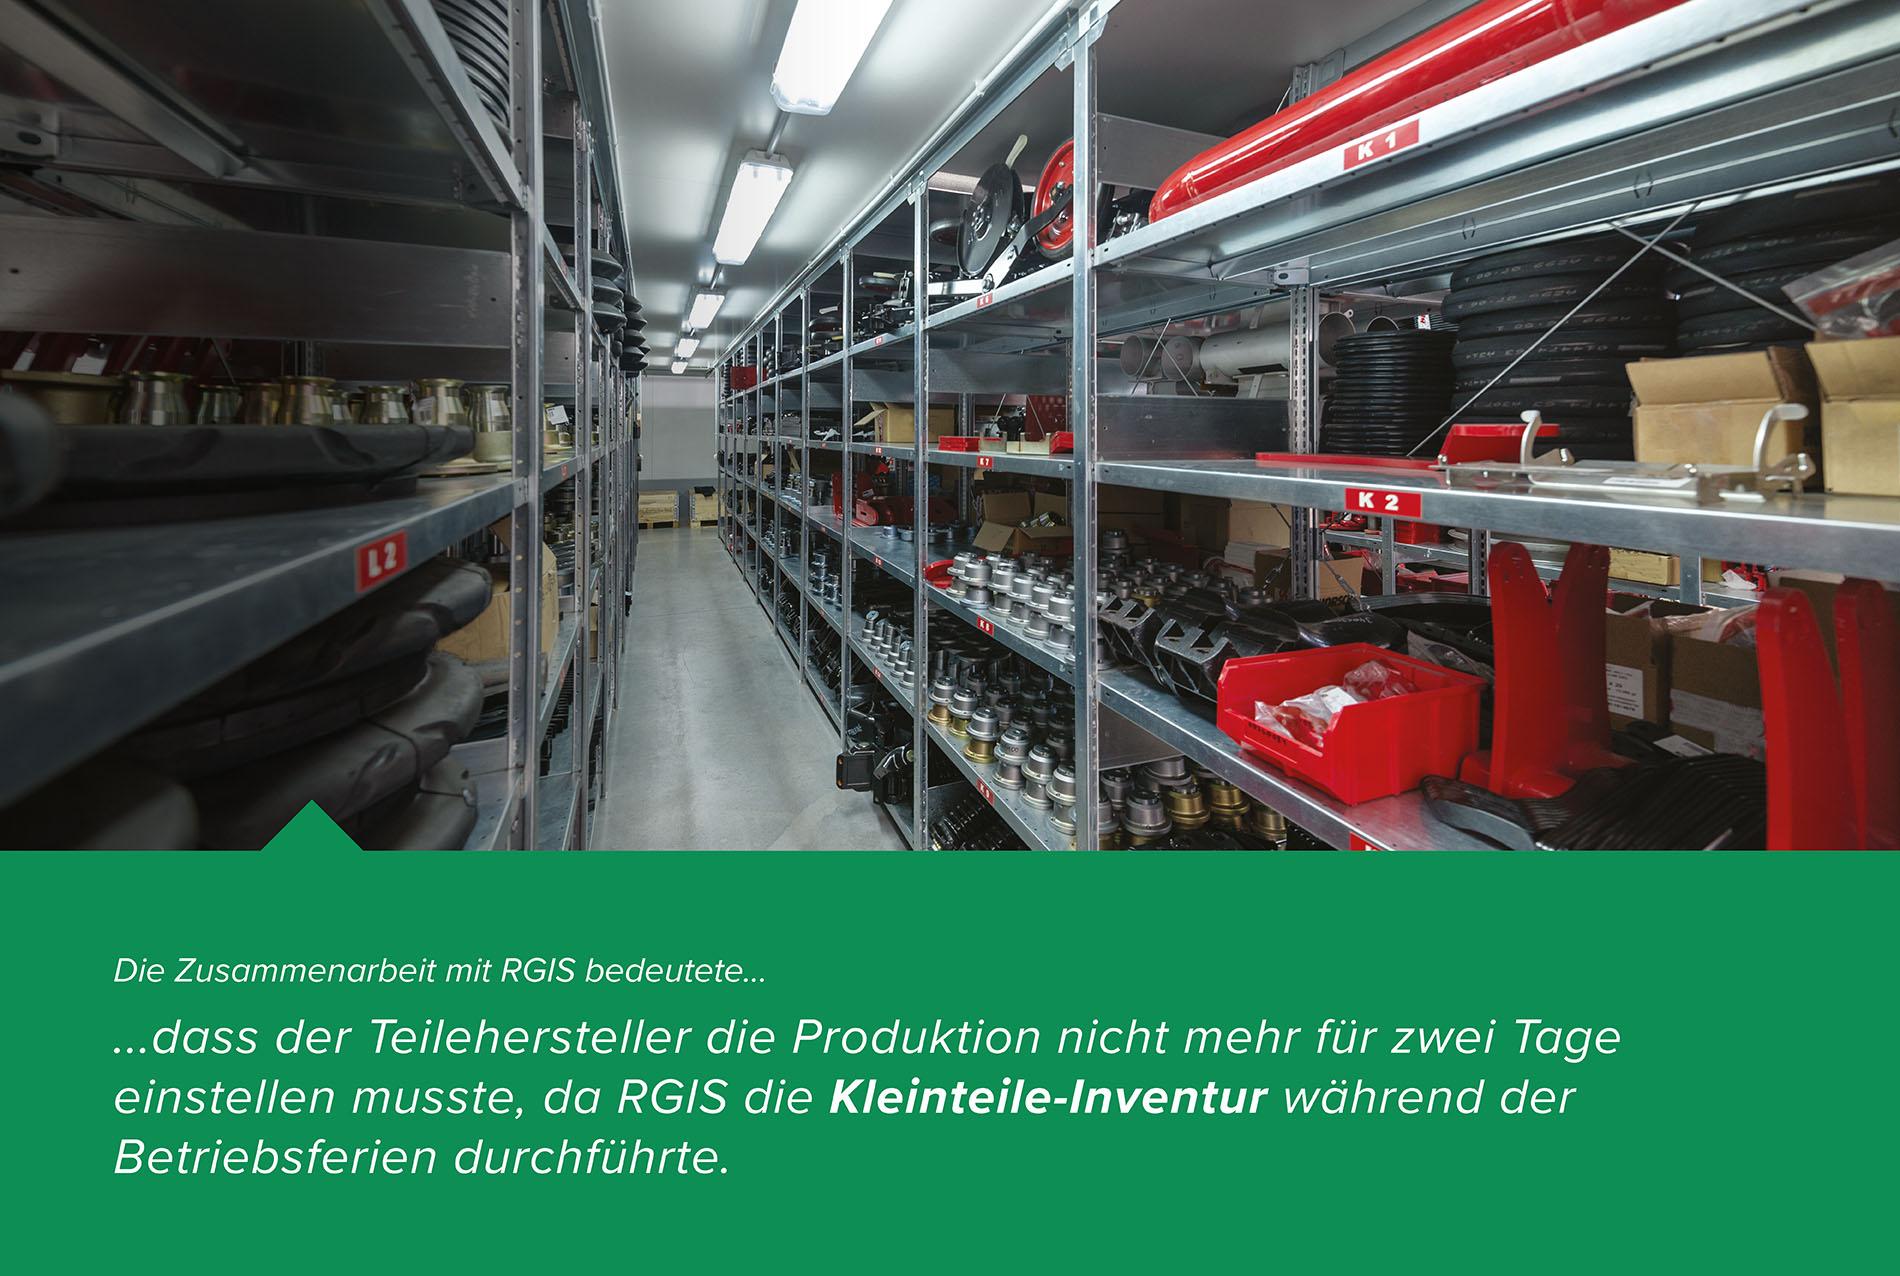 RGIS-Fallstudie Industrielle Bestandsaufnahme - Teilehersteller